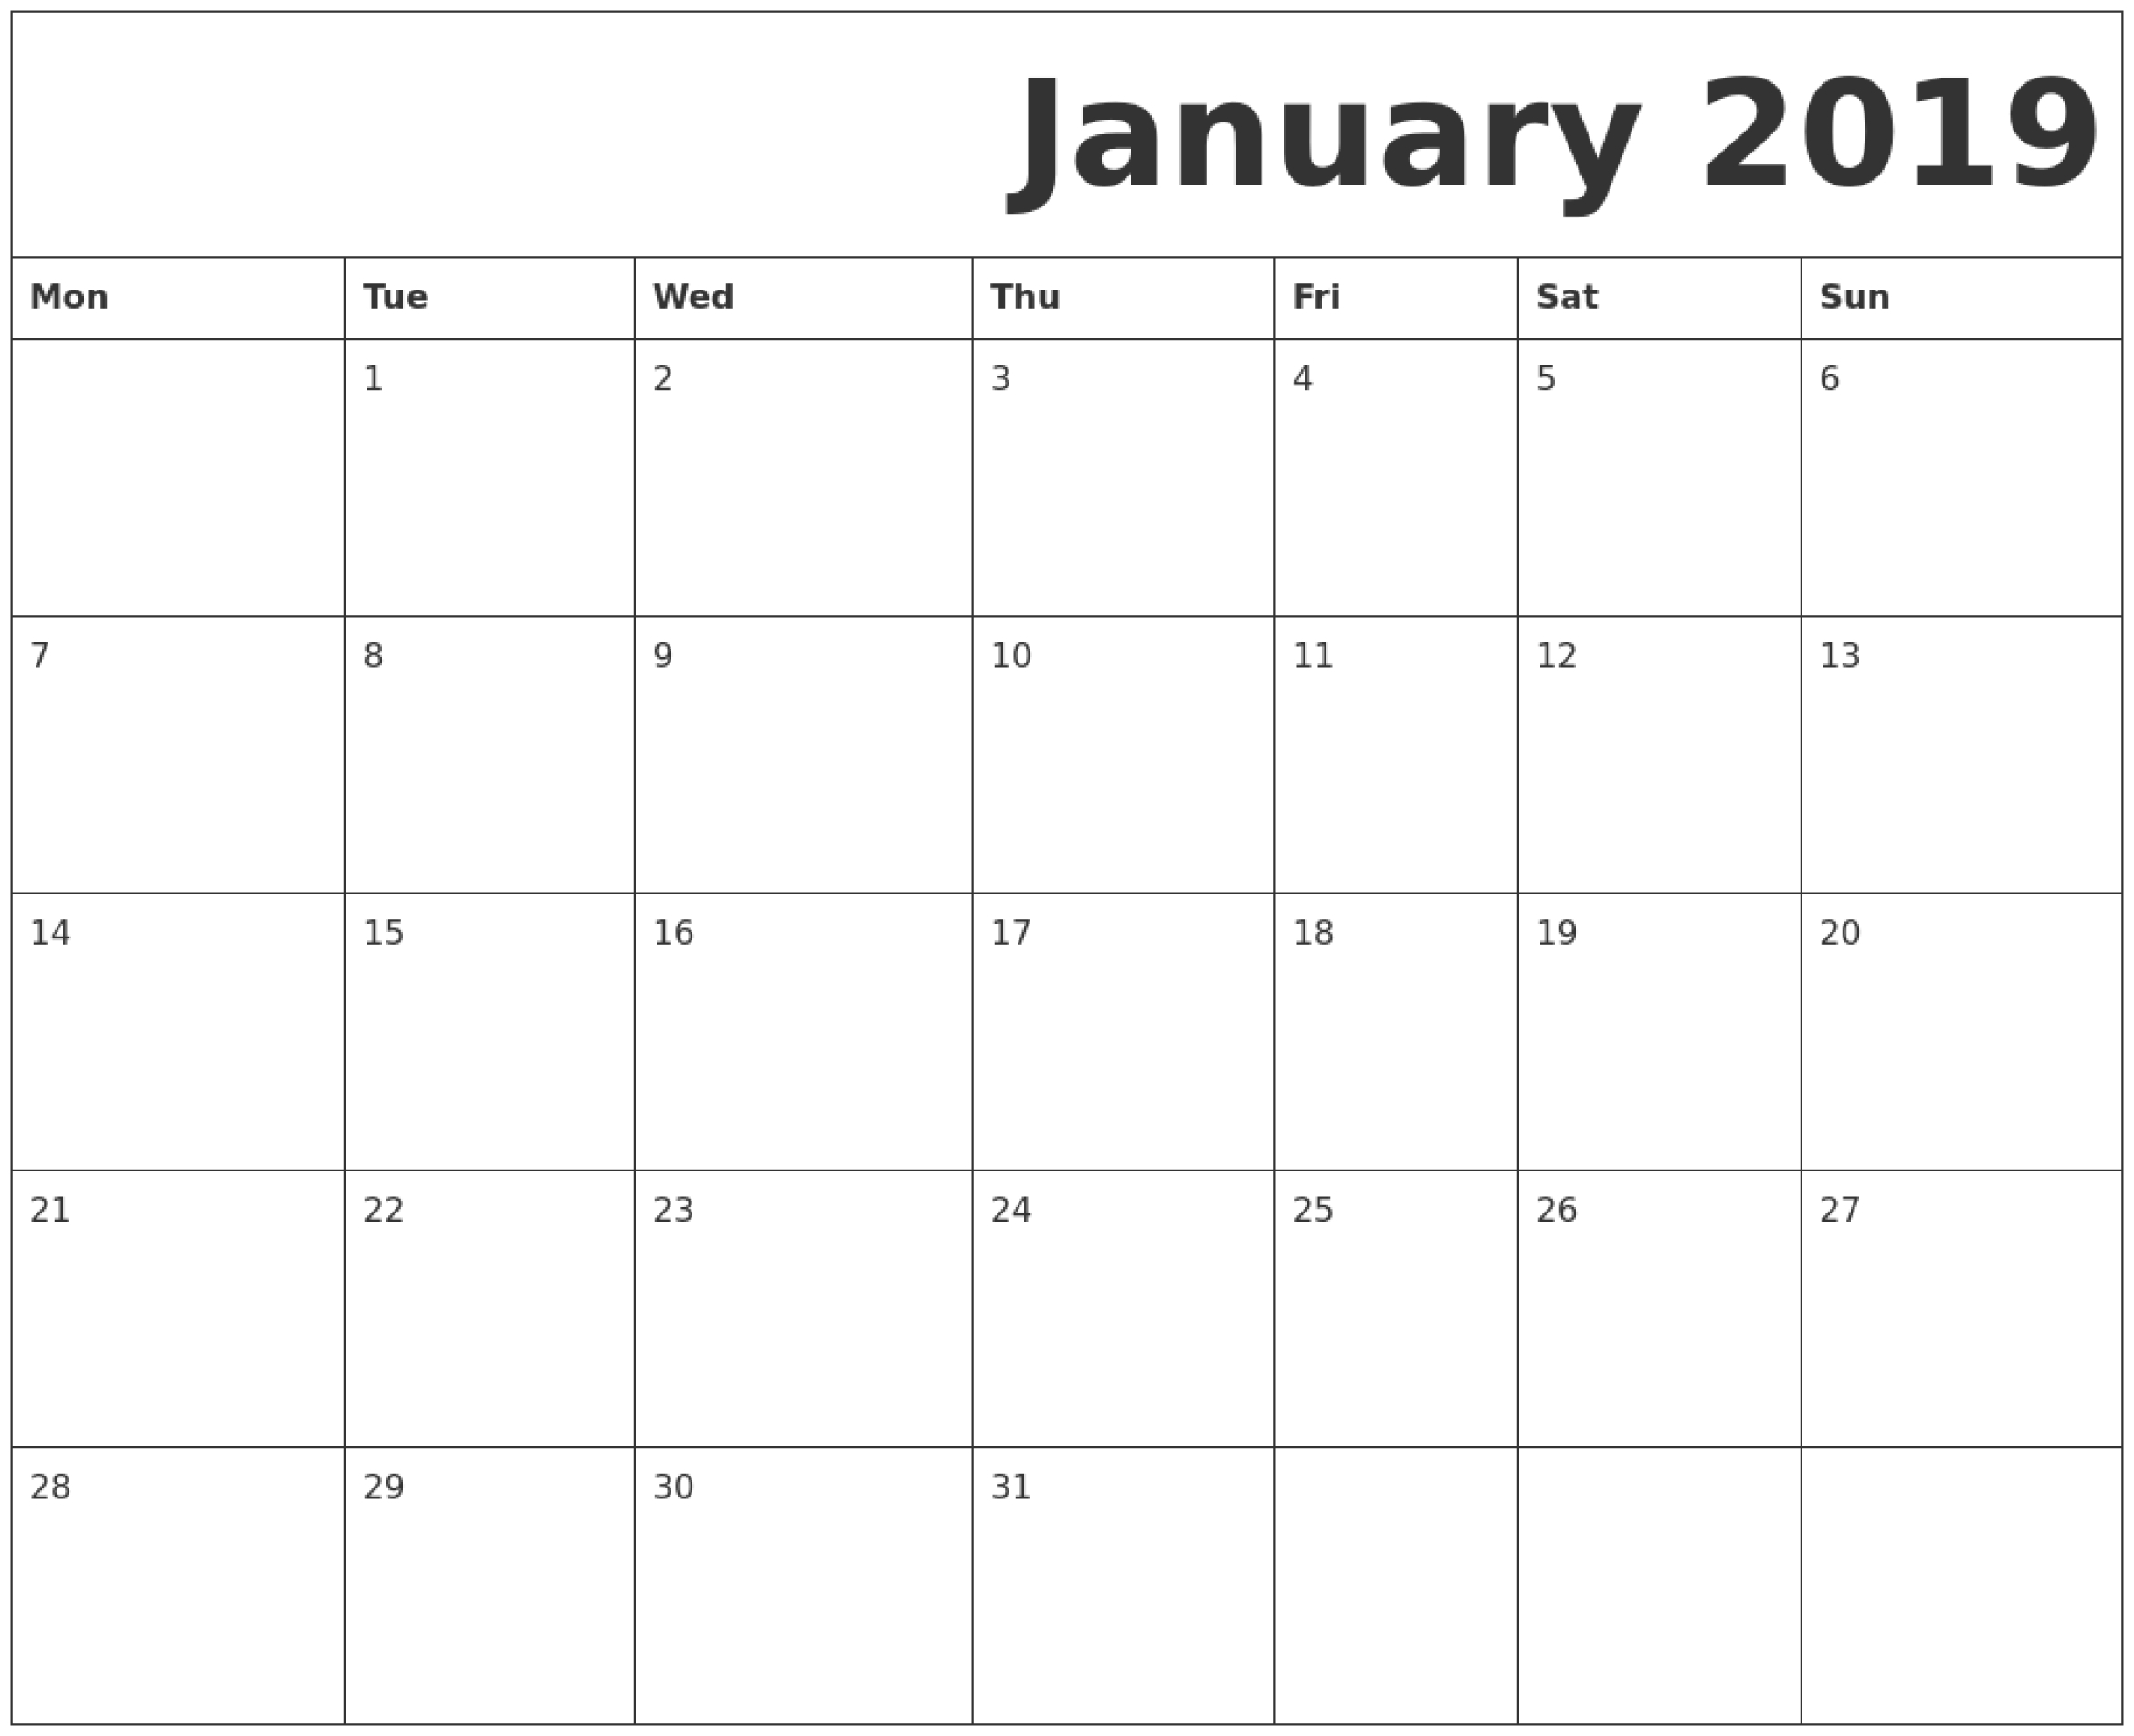 January 2019 Printable Calendar Monday Start. | January 2019 Calendar Template Starting With Monday